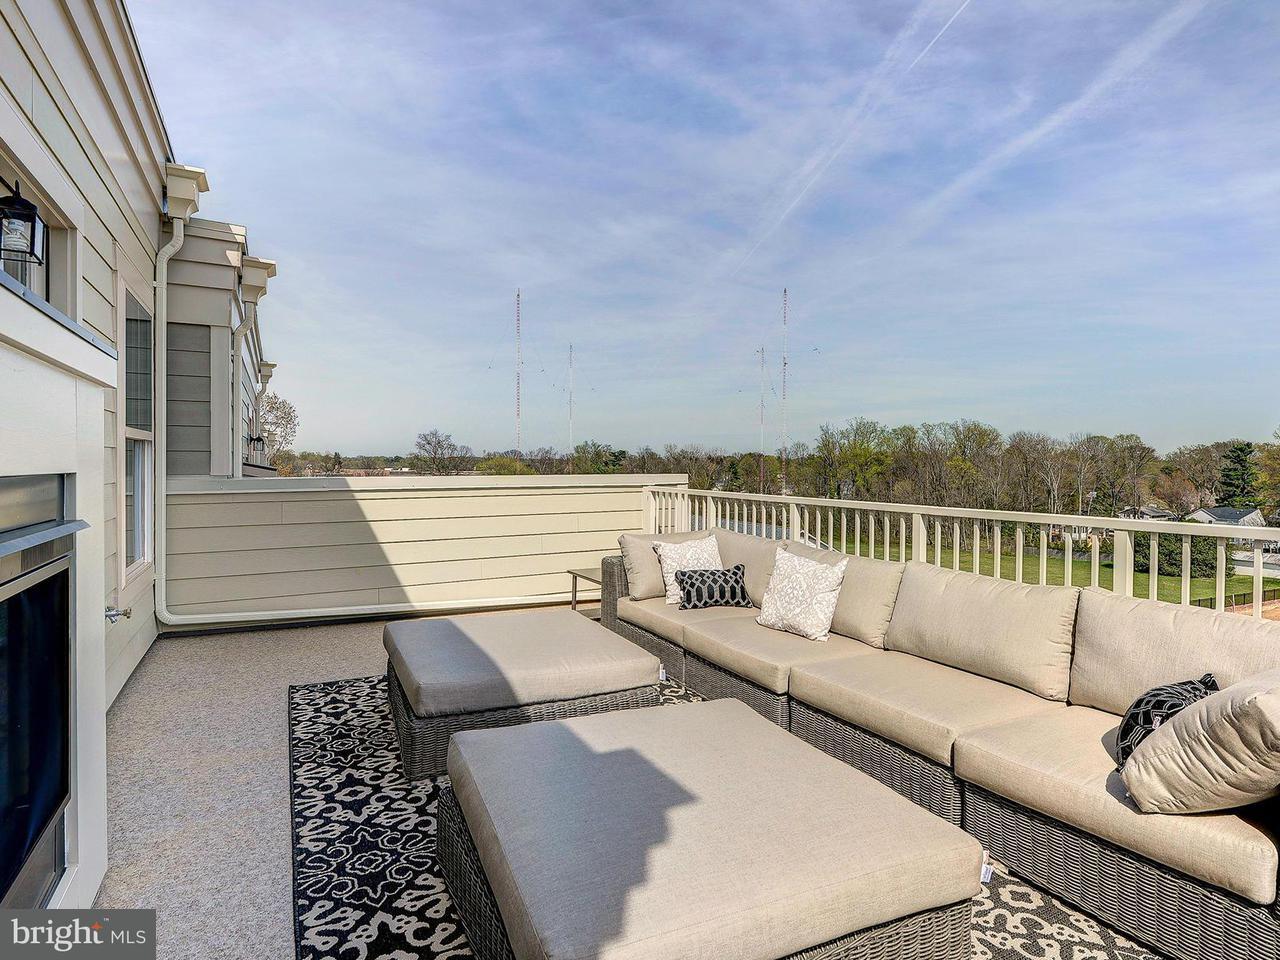 Additional photo for property listing at 3957 Oak St #0 3957 Oak St #0 Fairfax, 弗吉尼亚州 22030 美国